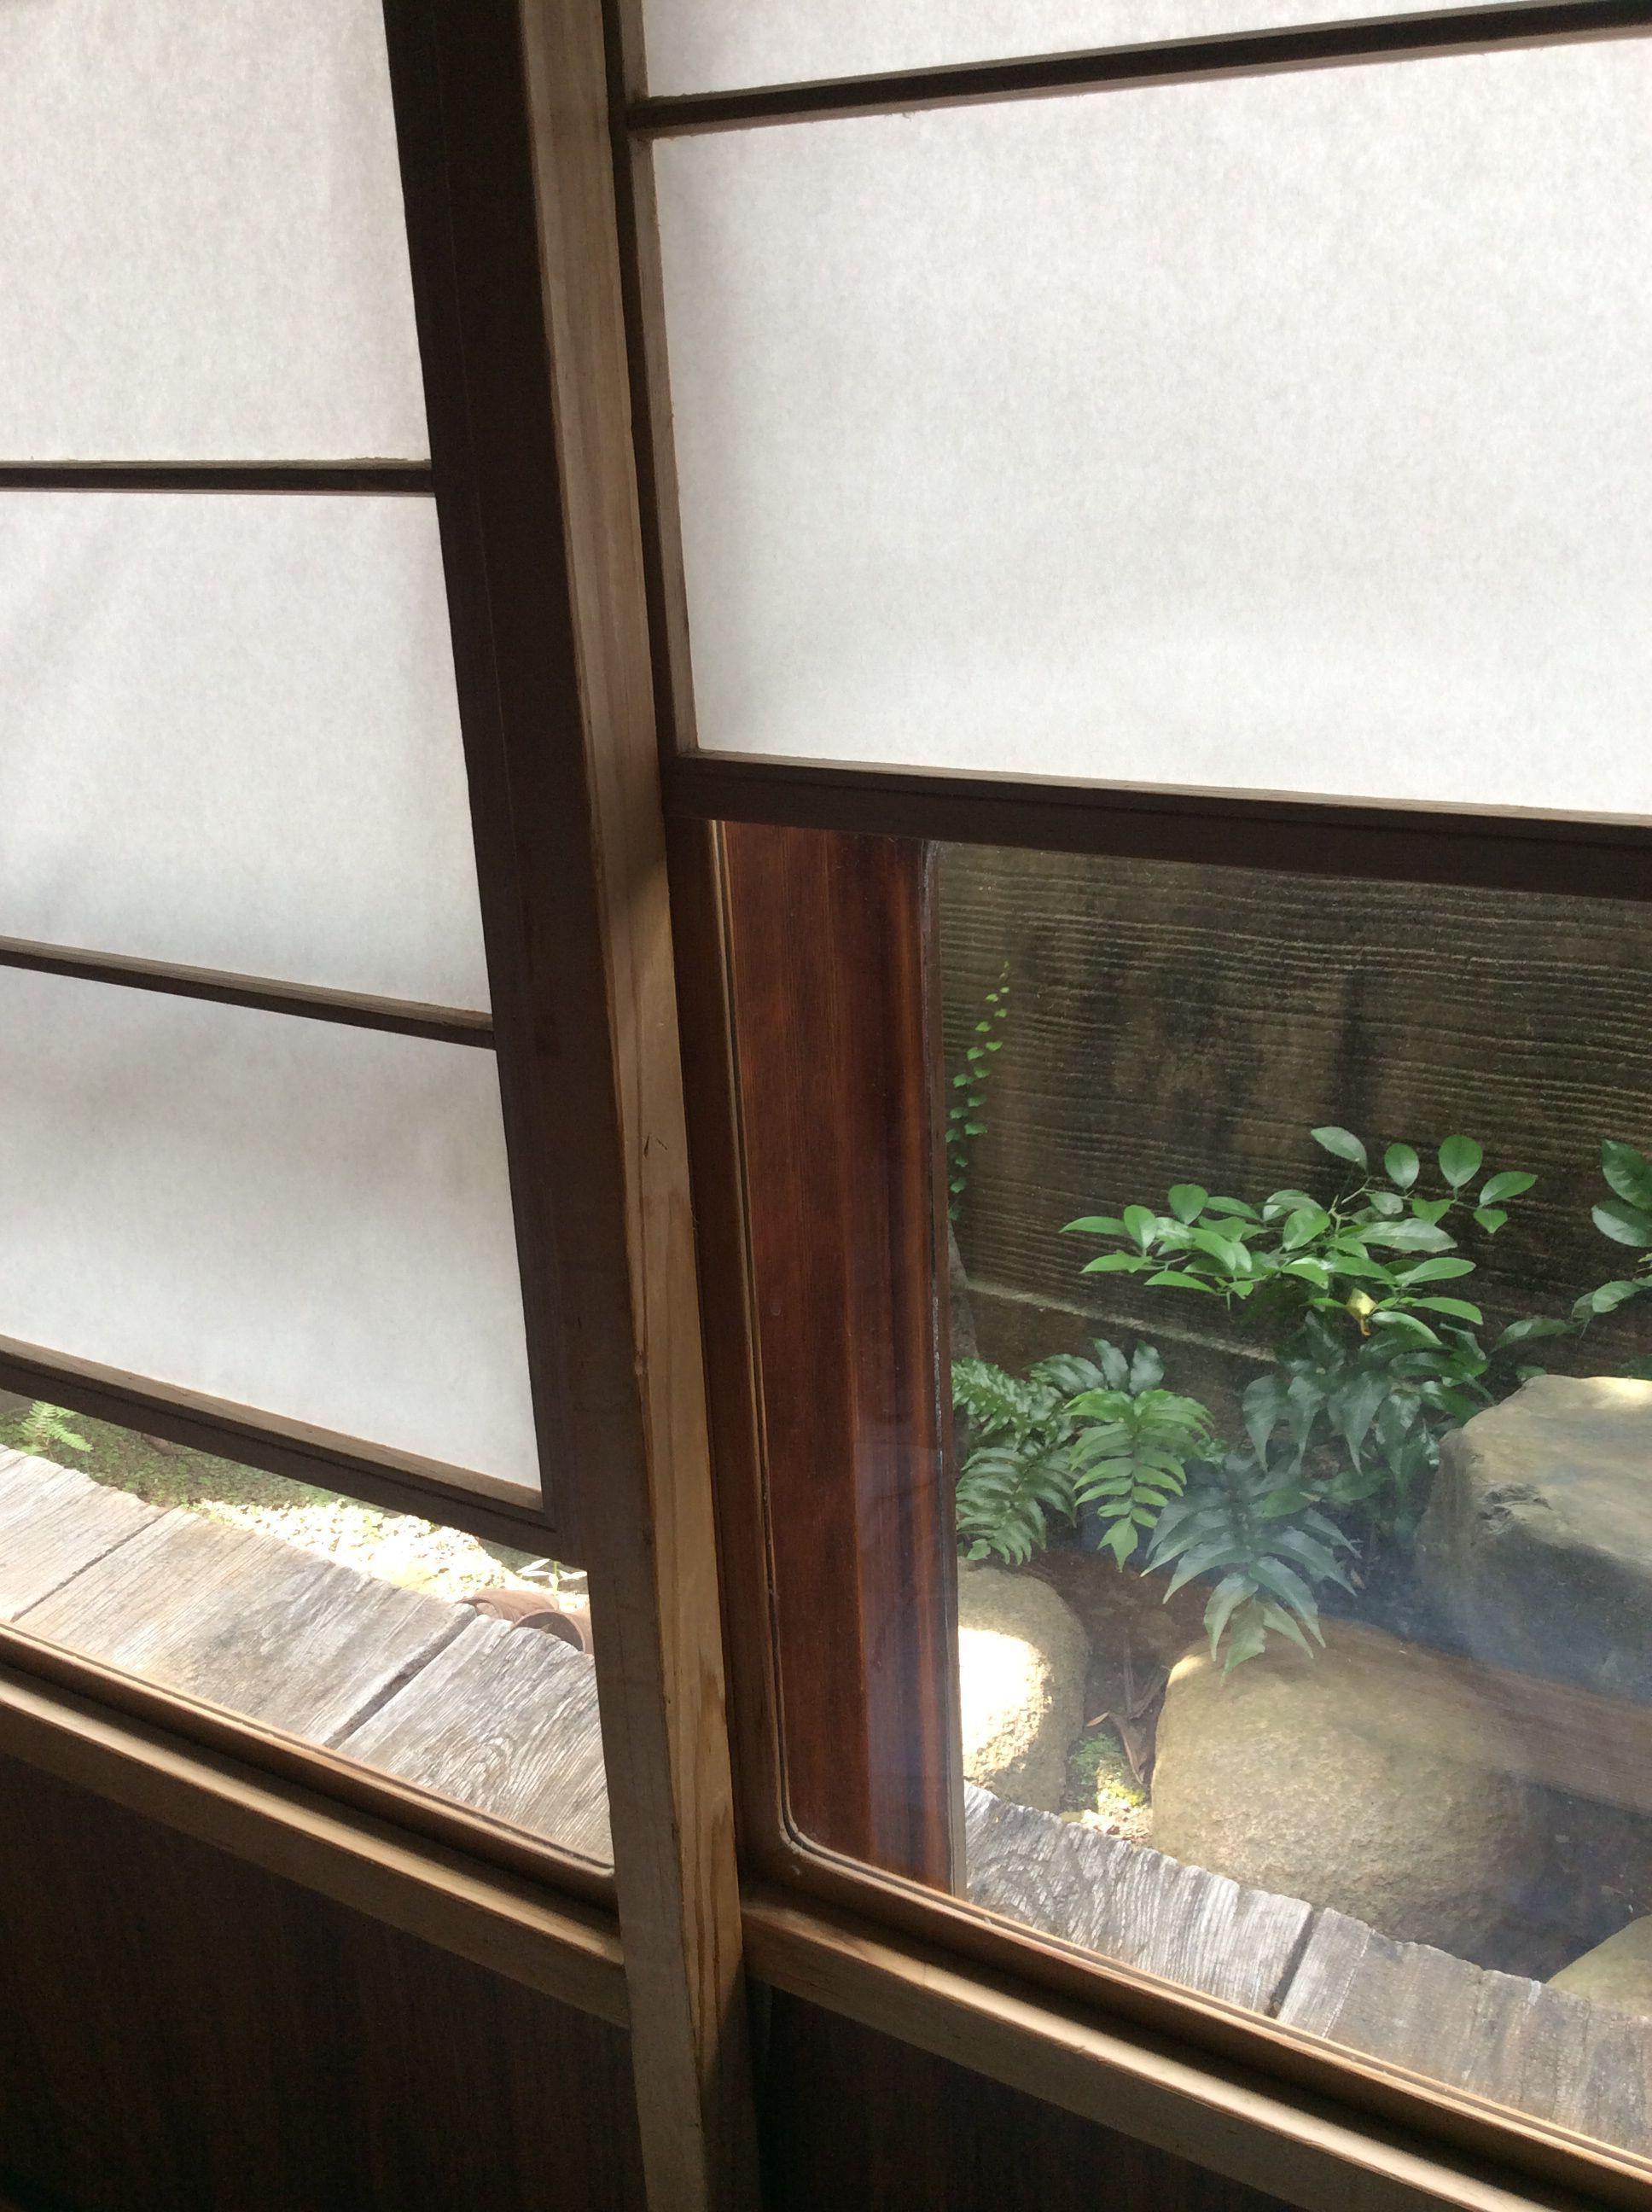 Hunting blind window ideas  wondrous useful ideas dark wooden blinds living room blinds ikea